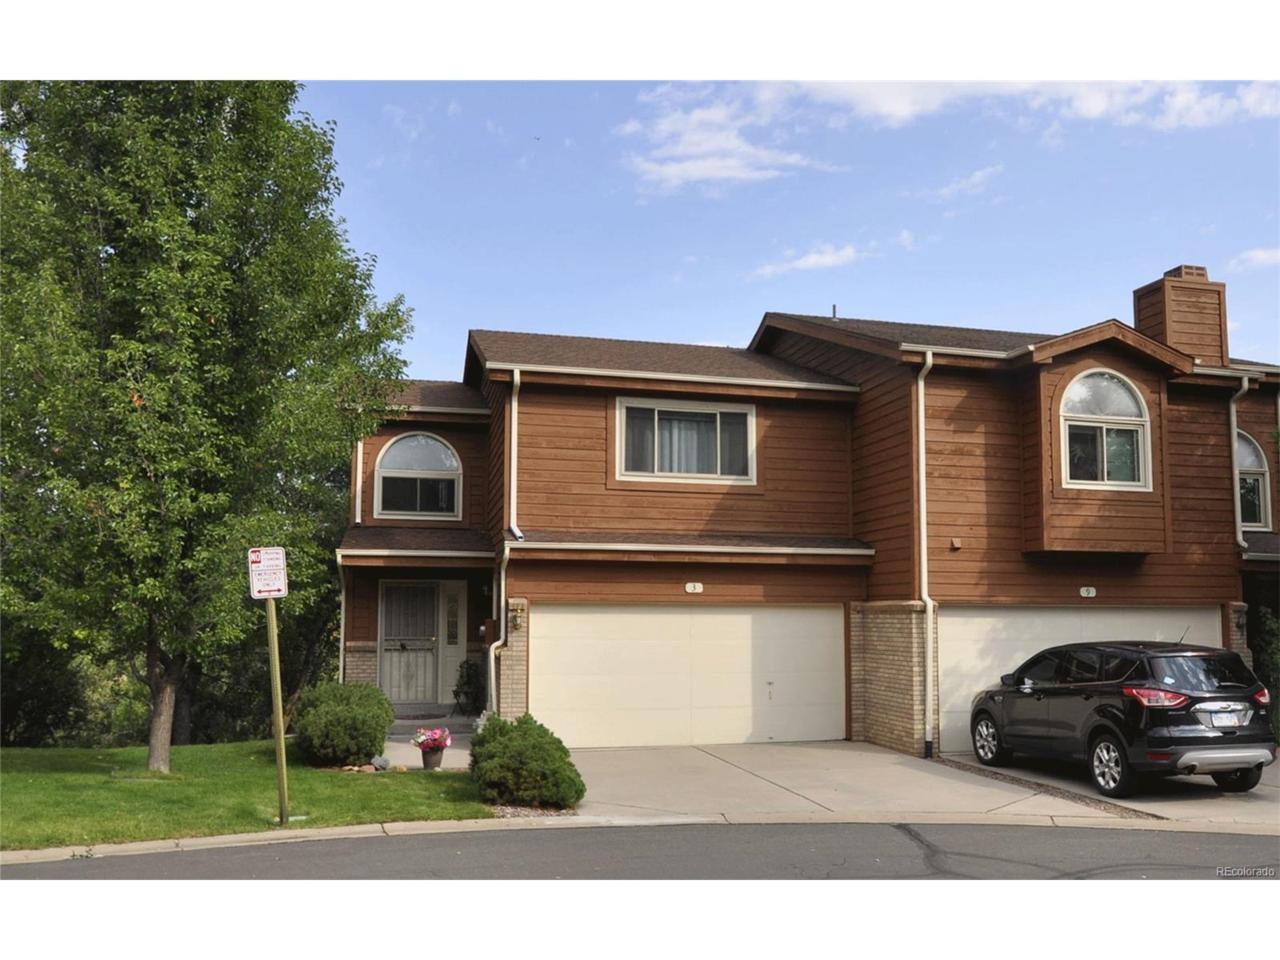 3 Ward Court, Lakewood, CO 80228 (MLS #7782197) :: 8z Real Estate